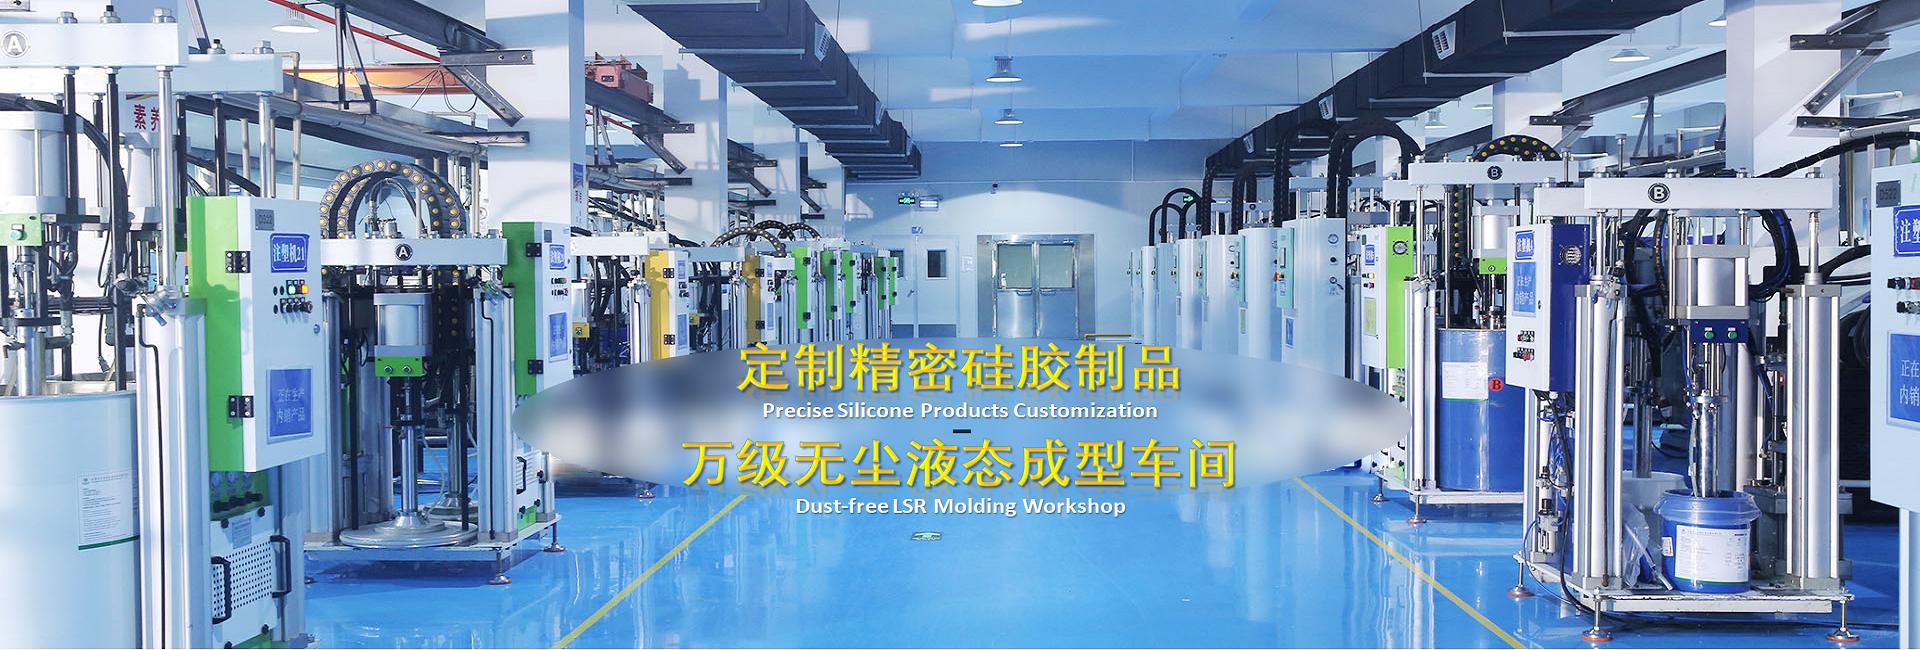 banner图四